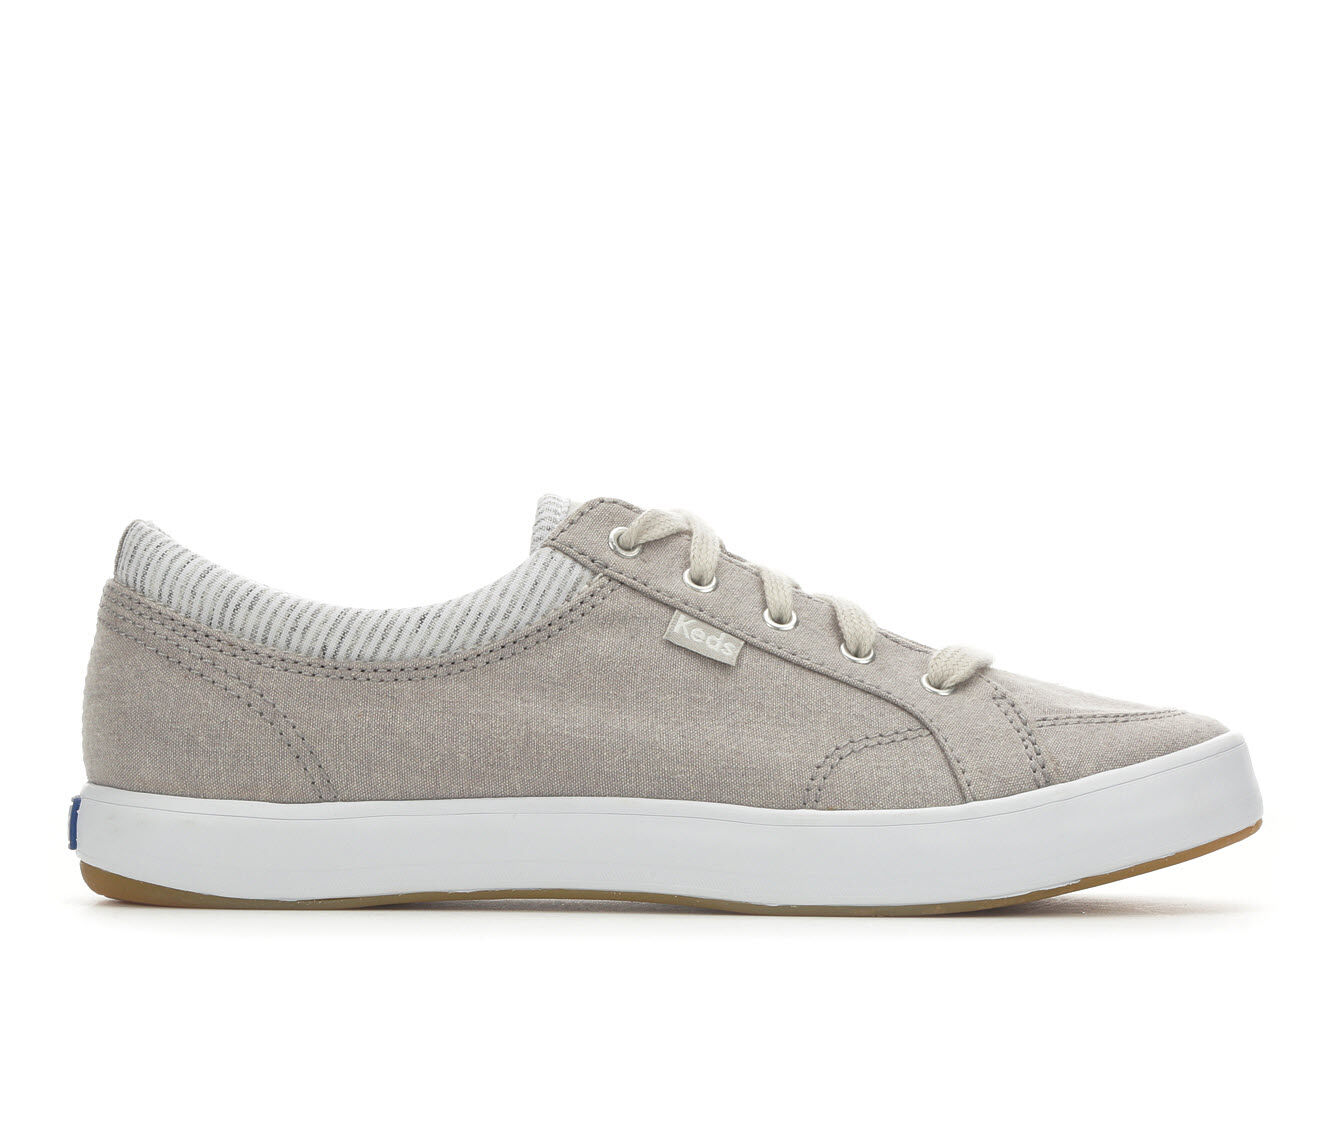 uk shoes_kd4469